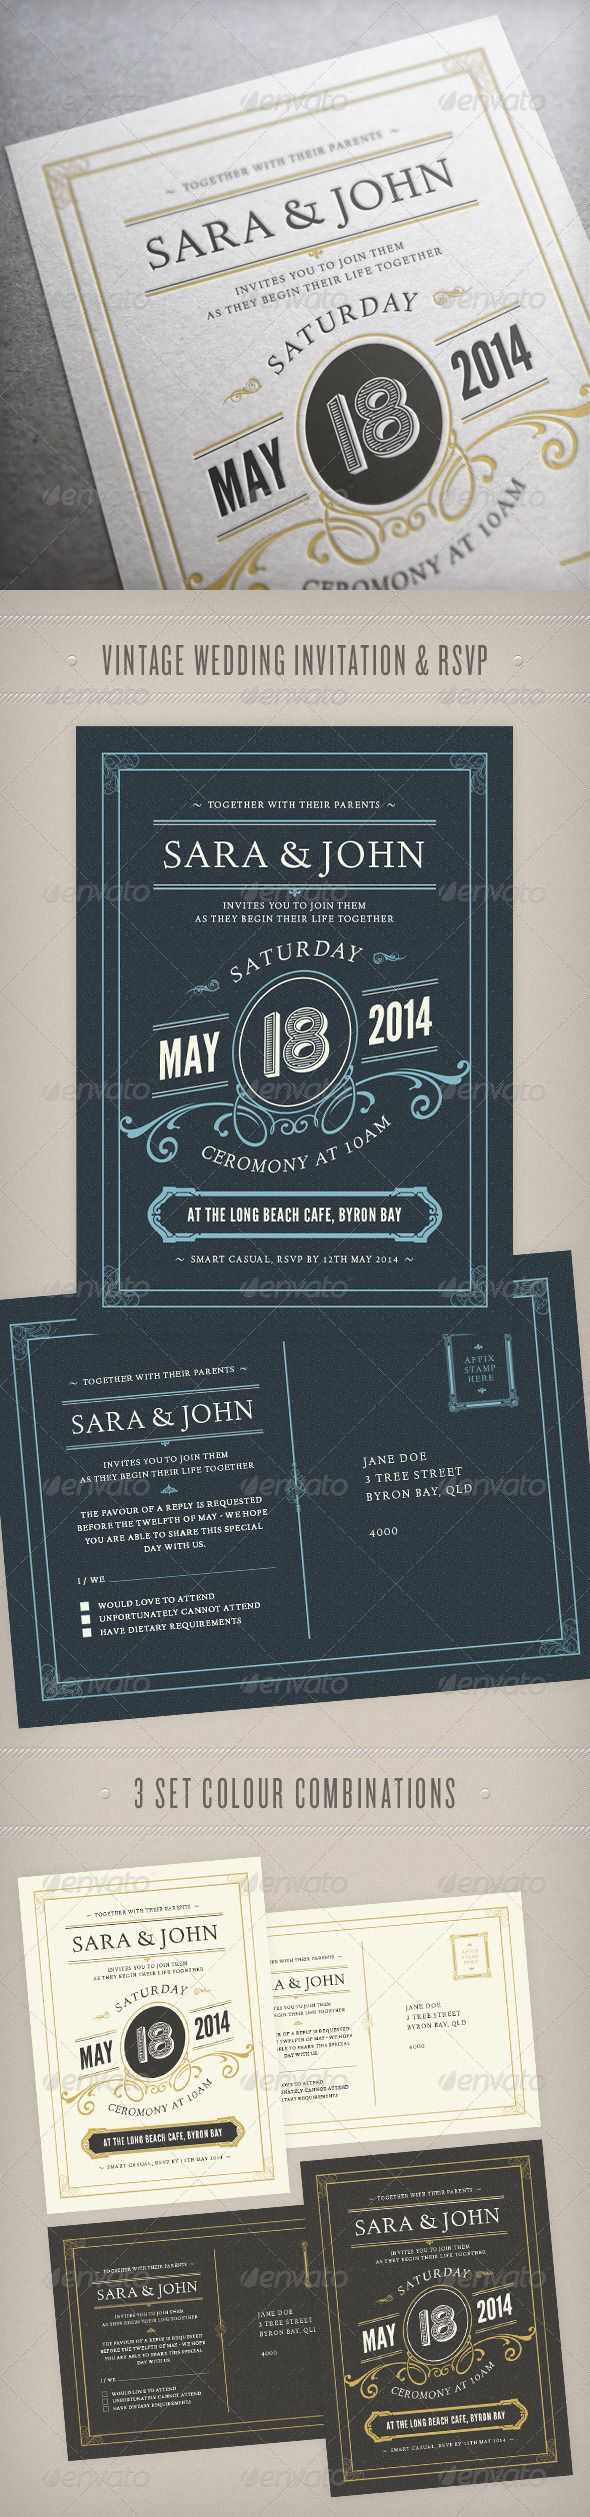 Wedding Invitation - Weddings Cards & Invites  Vintage wedding invitation and RSVP in 3 colour combinations #wedding #invite